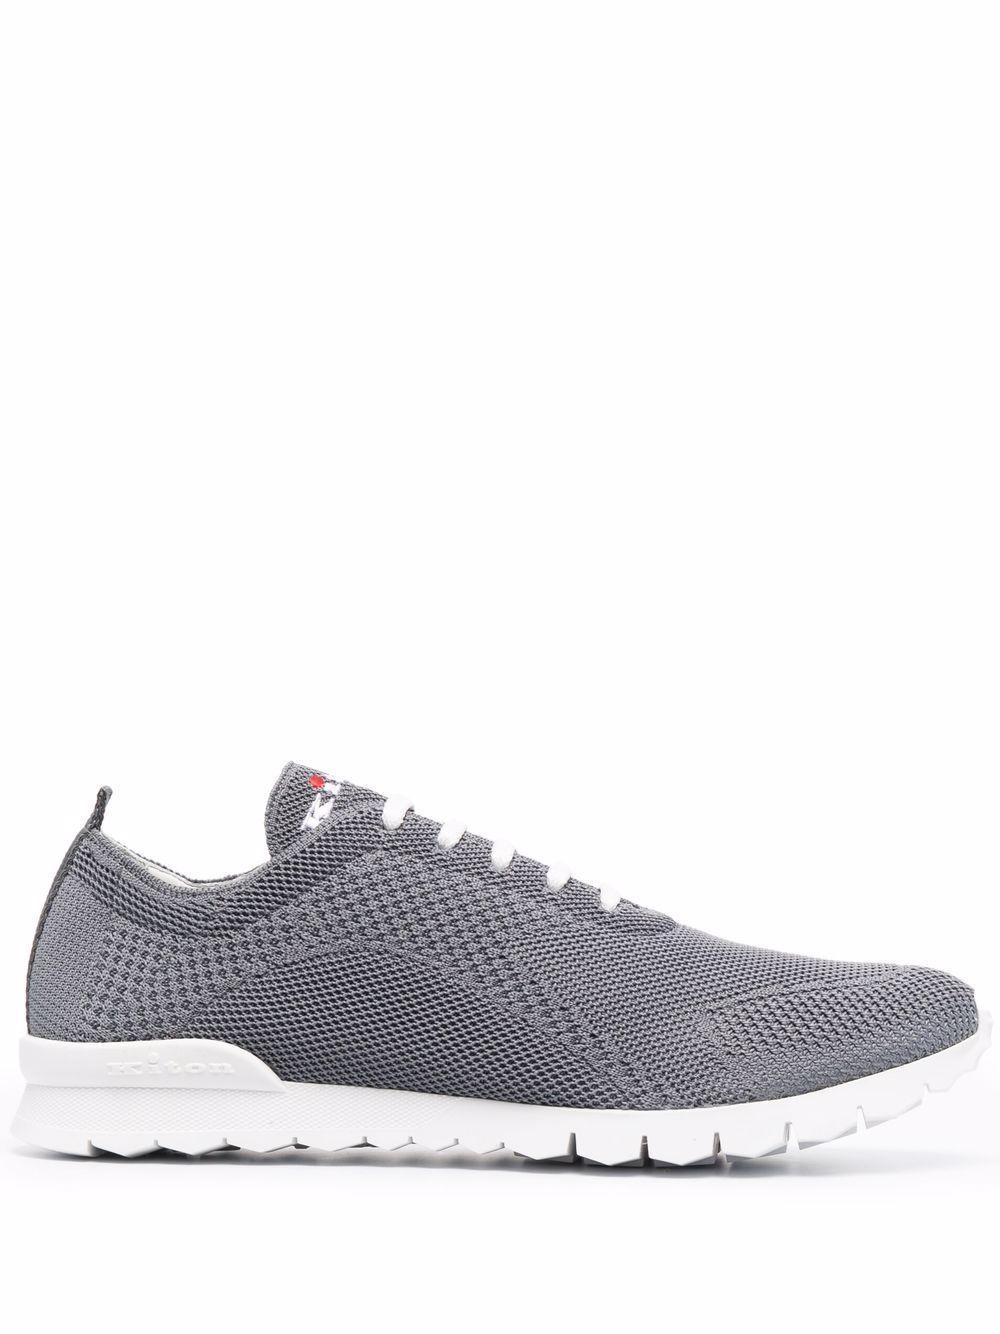 Sneaker in cotone